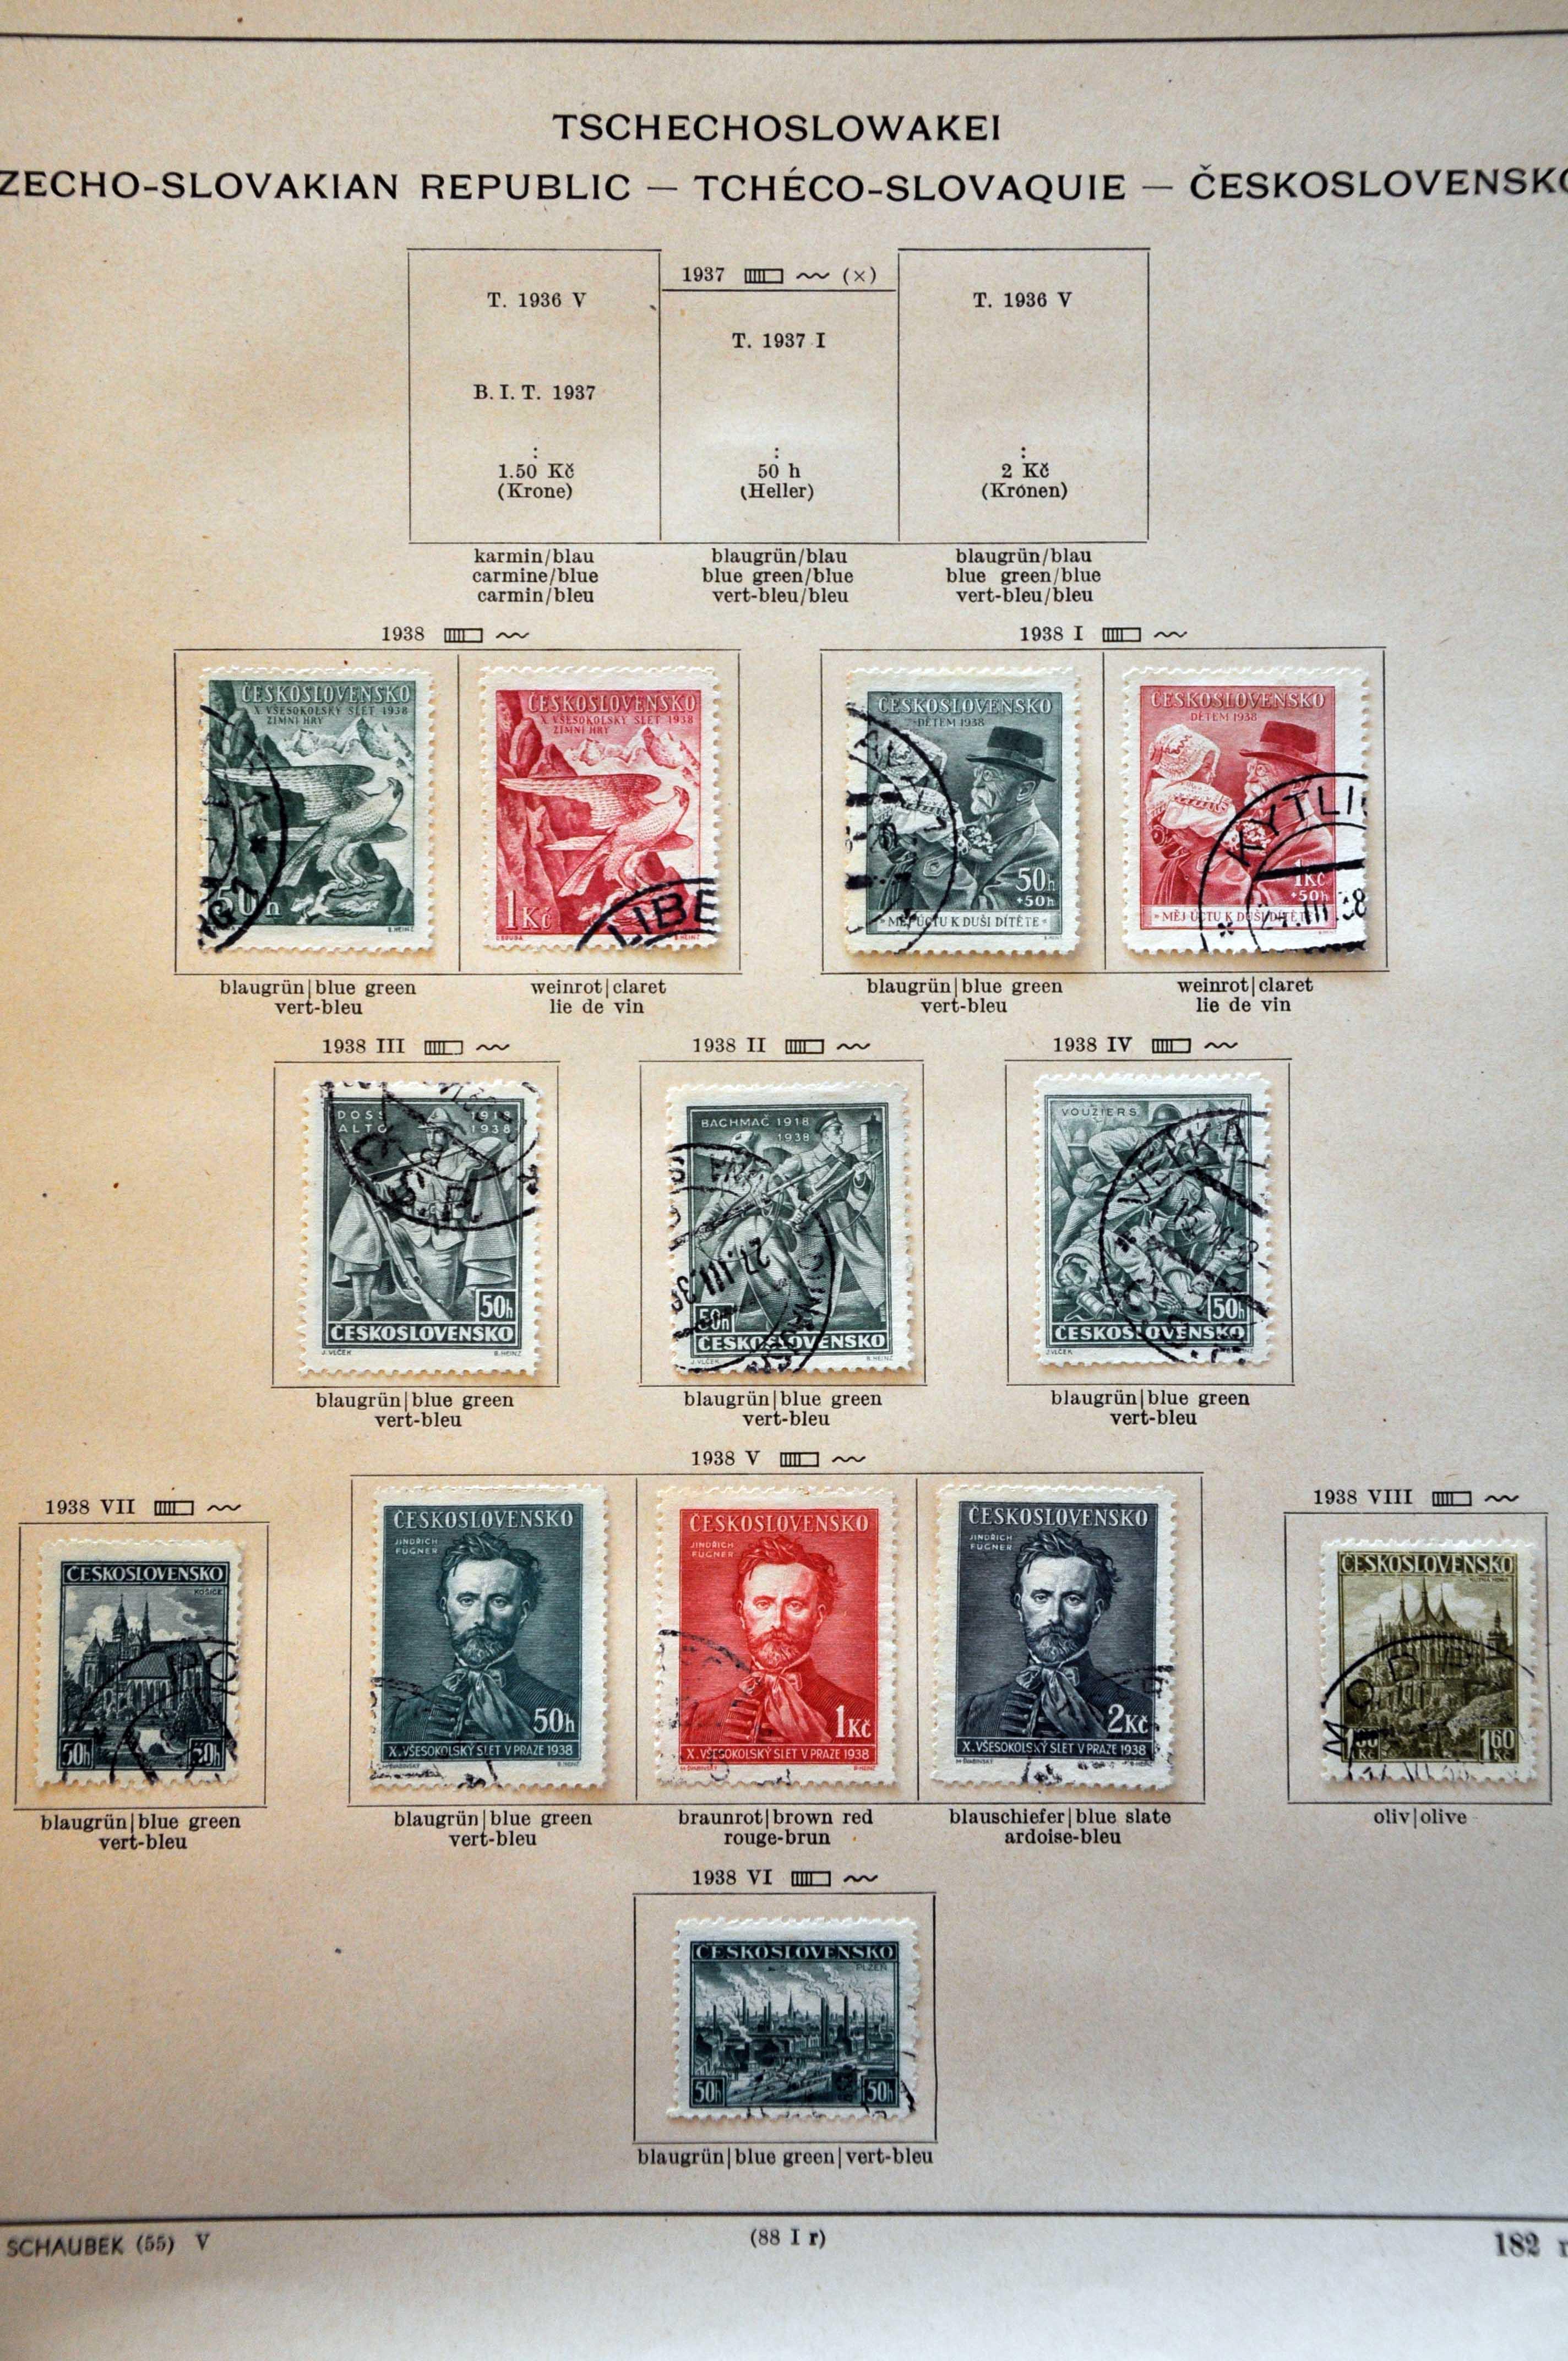 Stamp Auction - European Countries Czechoslovakia - Auction